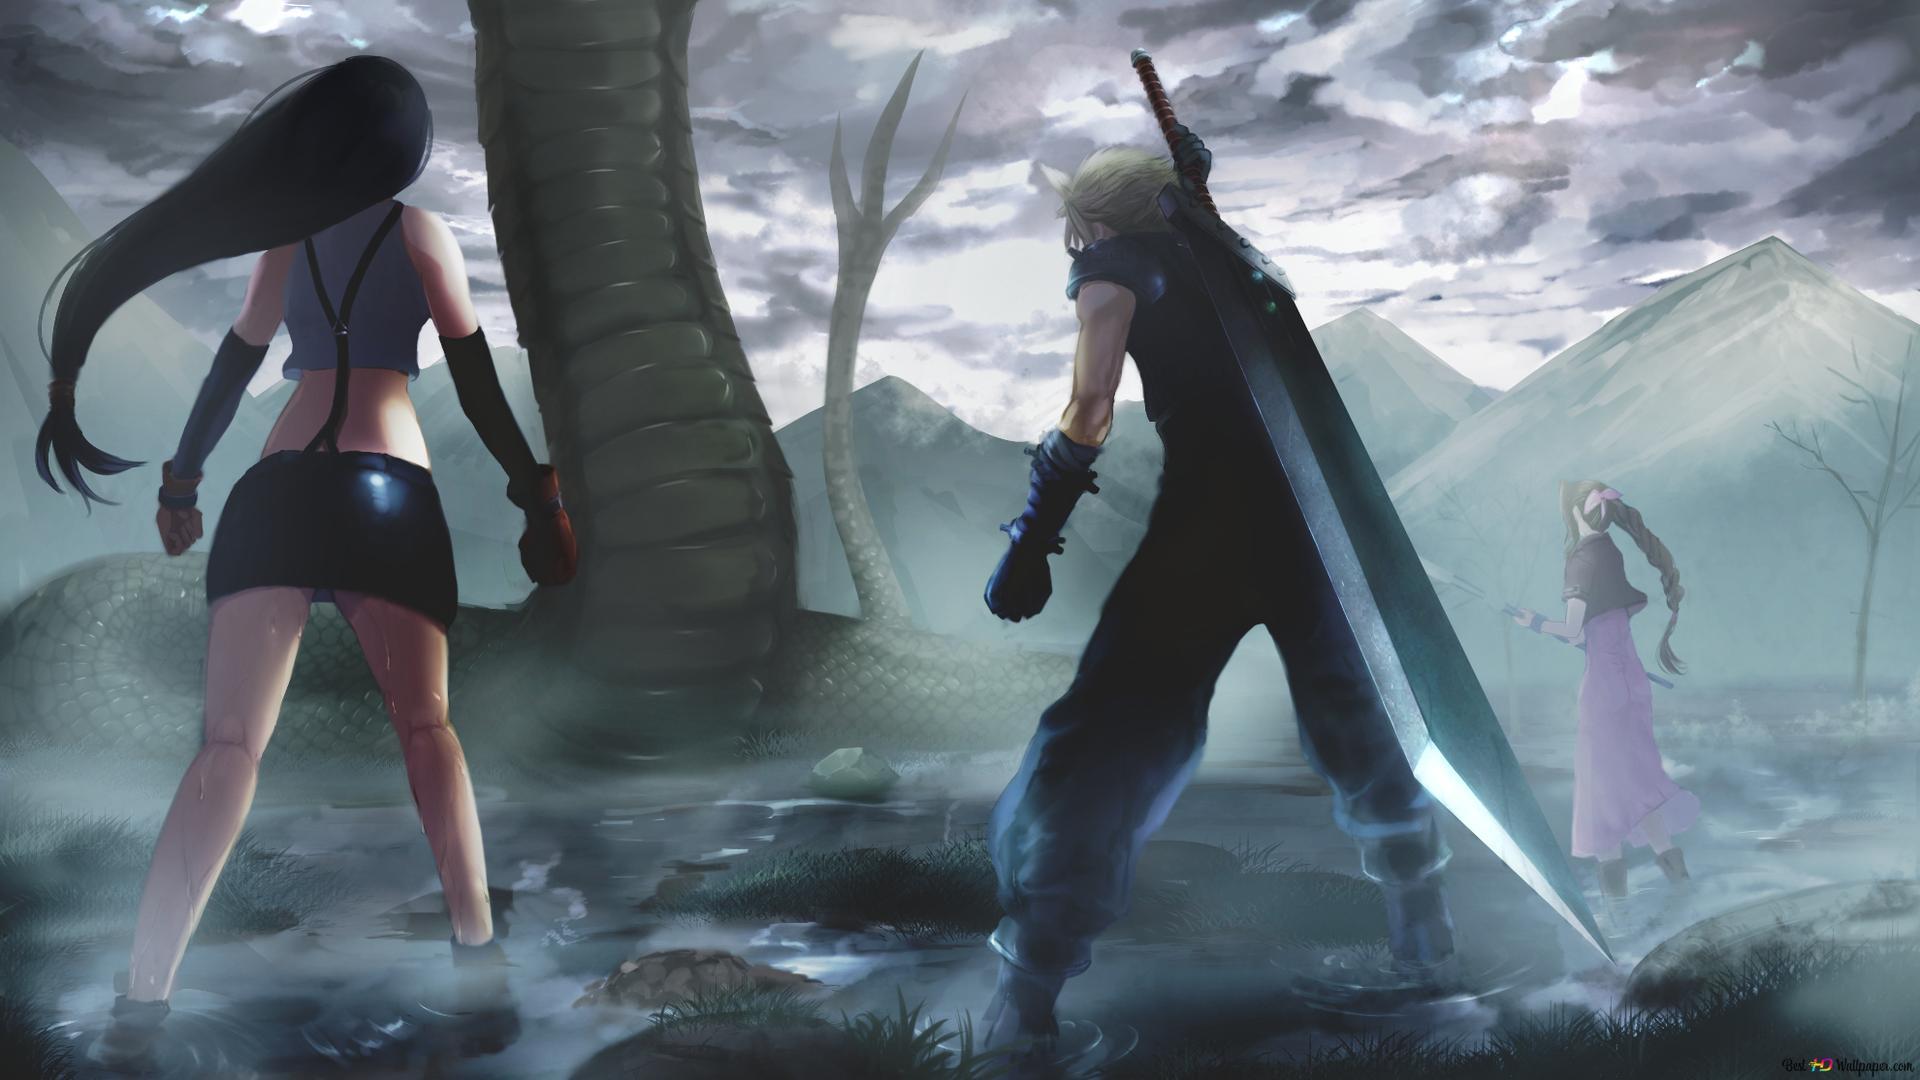 Final Fantasy Vii Tifa Lockhart Cloud Strife Aerith